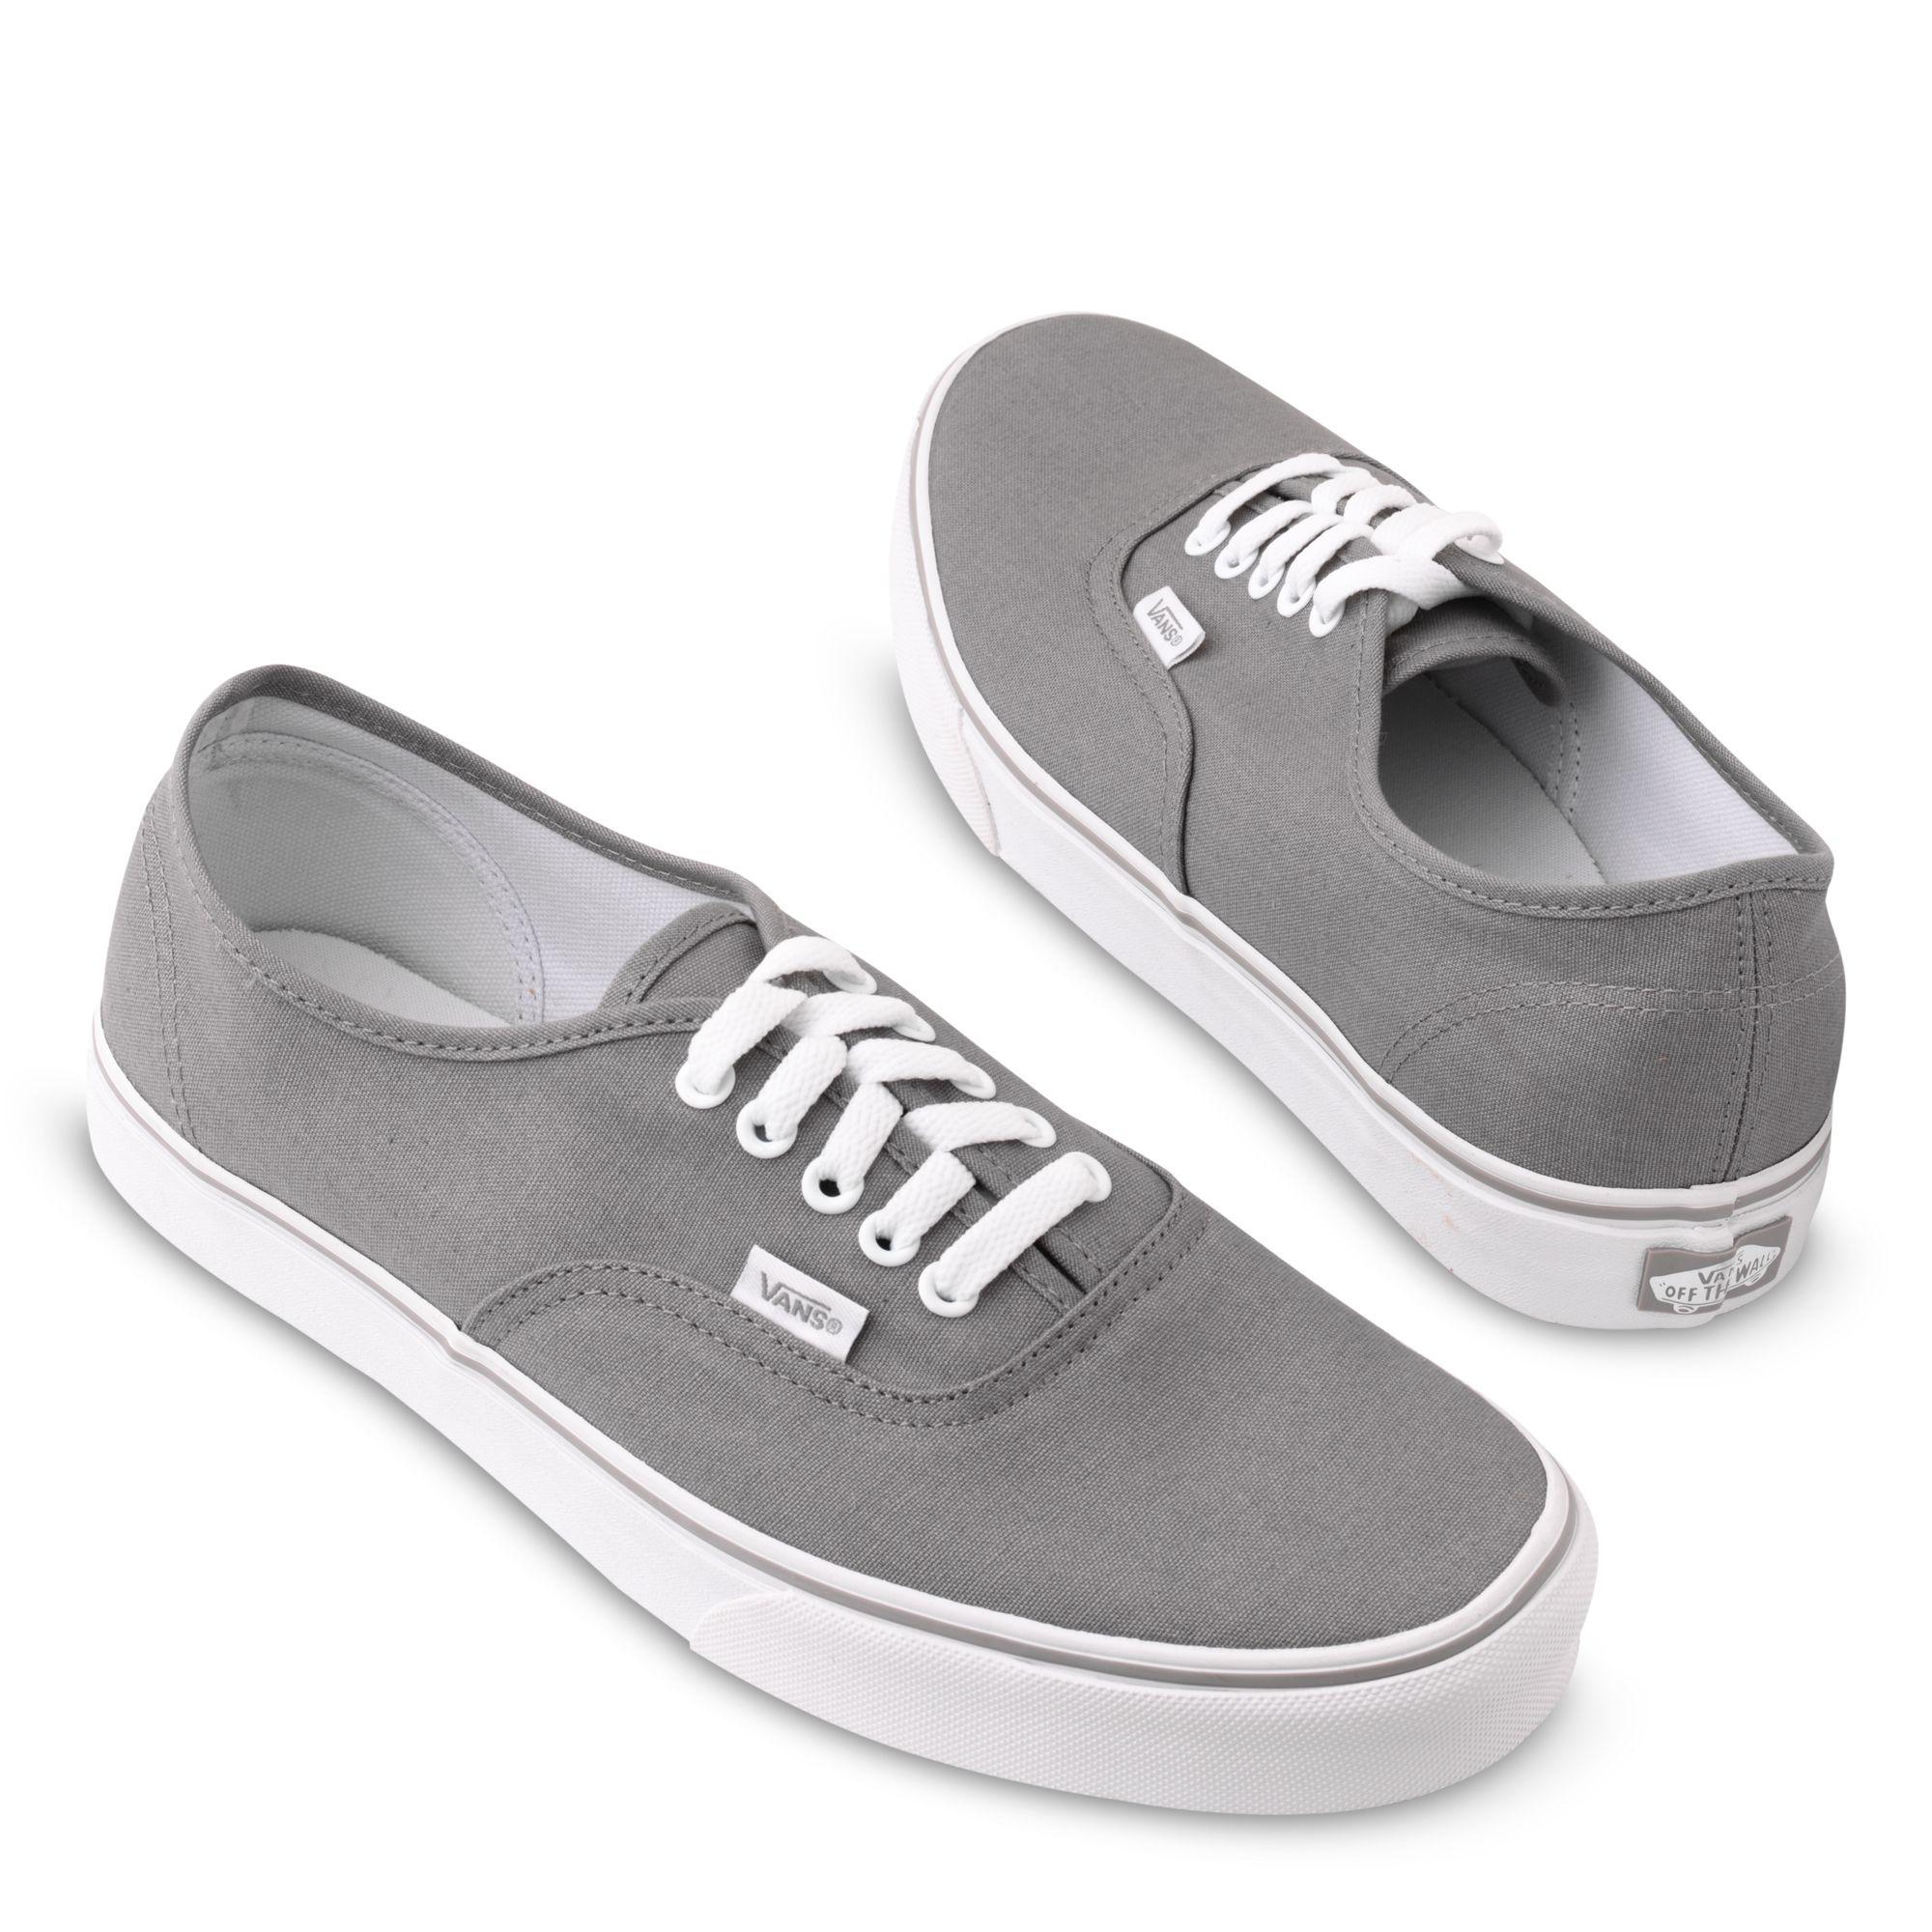 d1296c1d27 Vans Authentic Basic Plimsolls in Gray for Men - Lyst